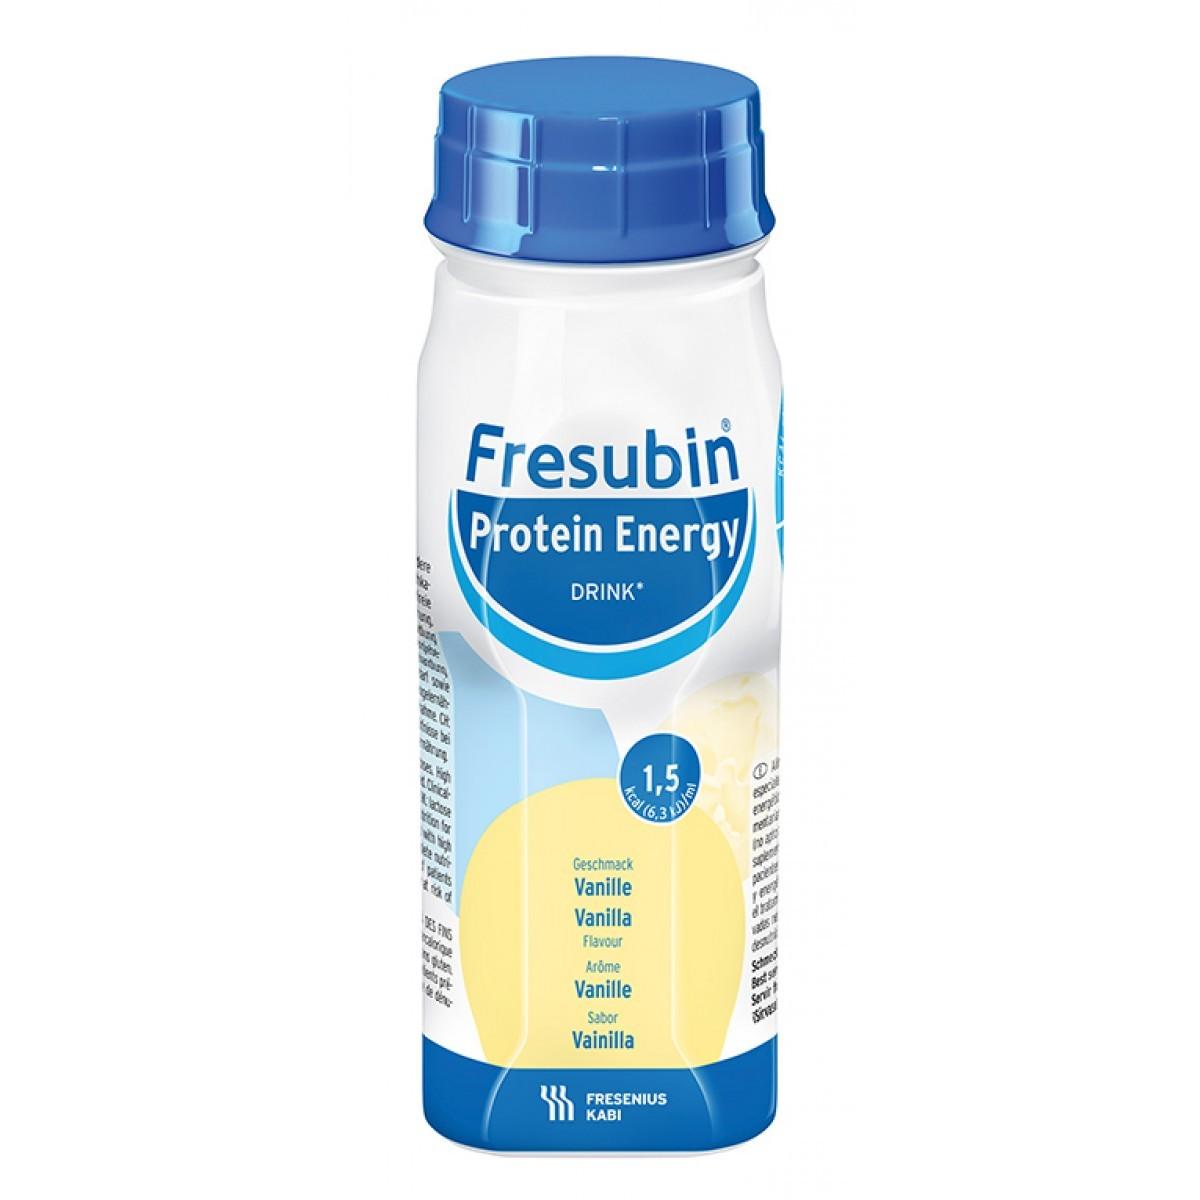 Fresubin Protein Energy Drink Baunilha - 200 mL - (Fresenius)